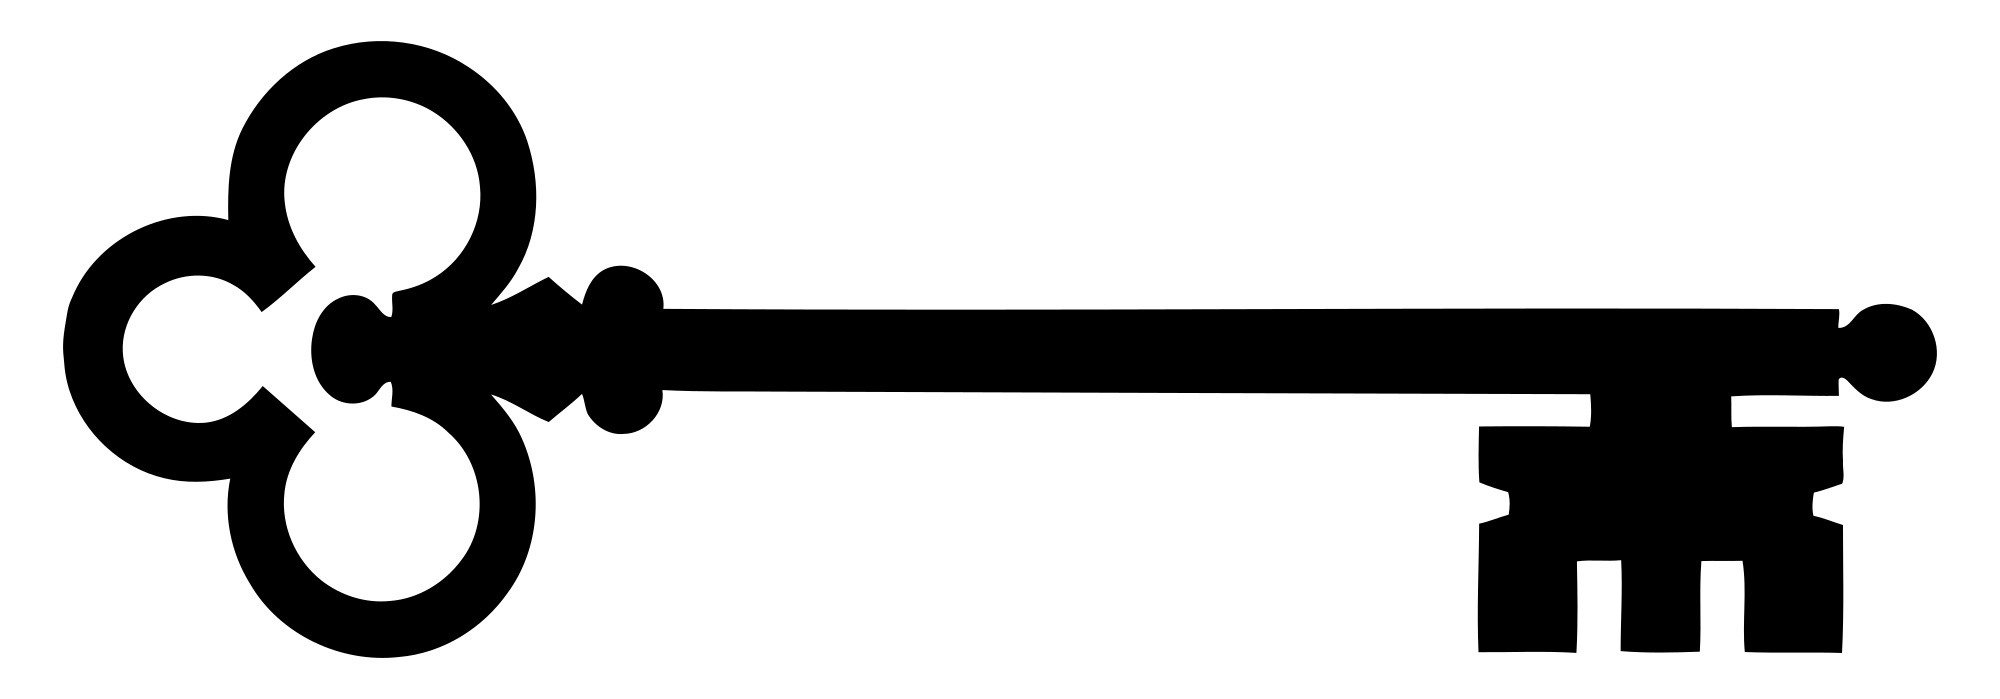 Keys silhouette at getdrawings. One clipart maraca